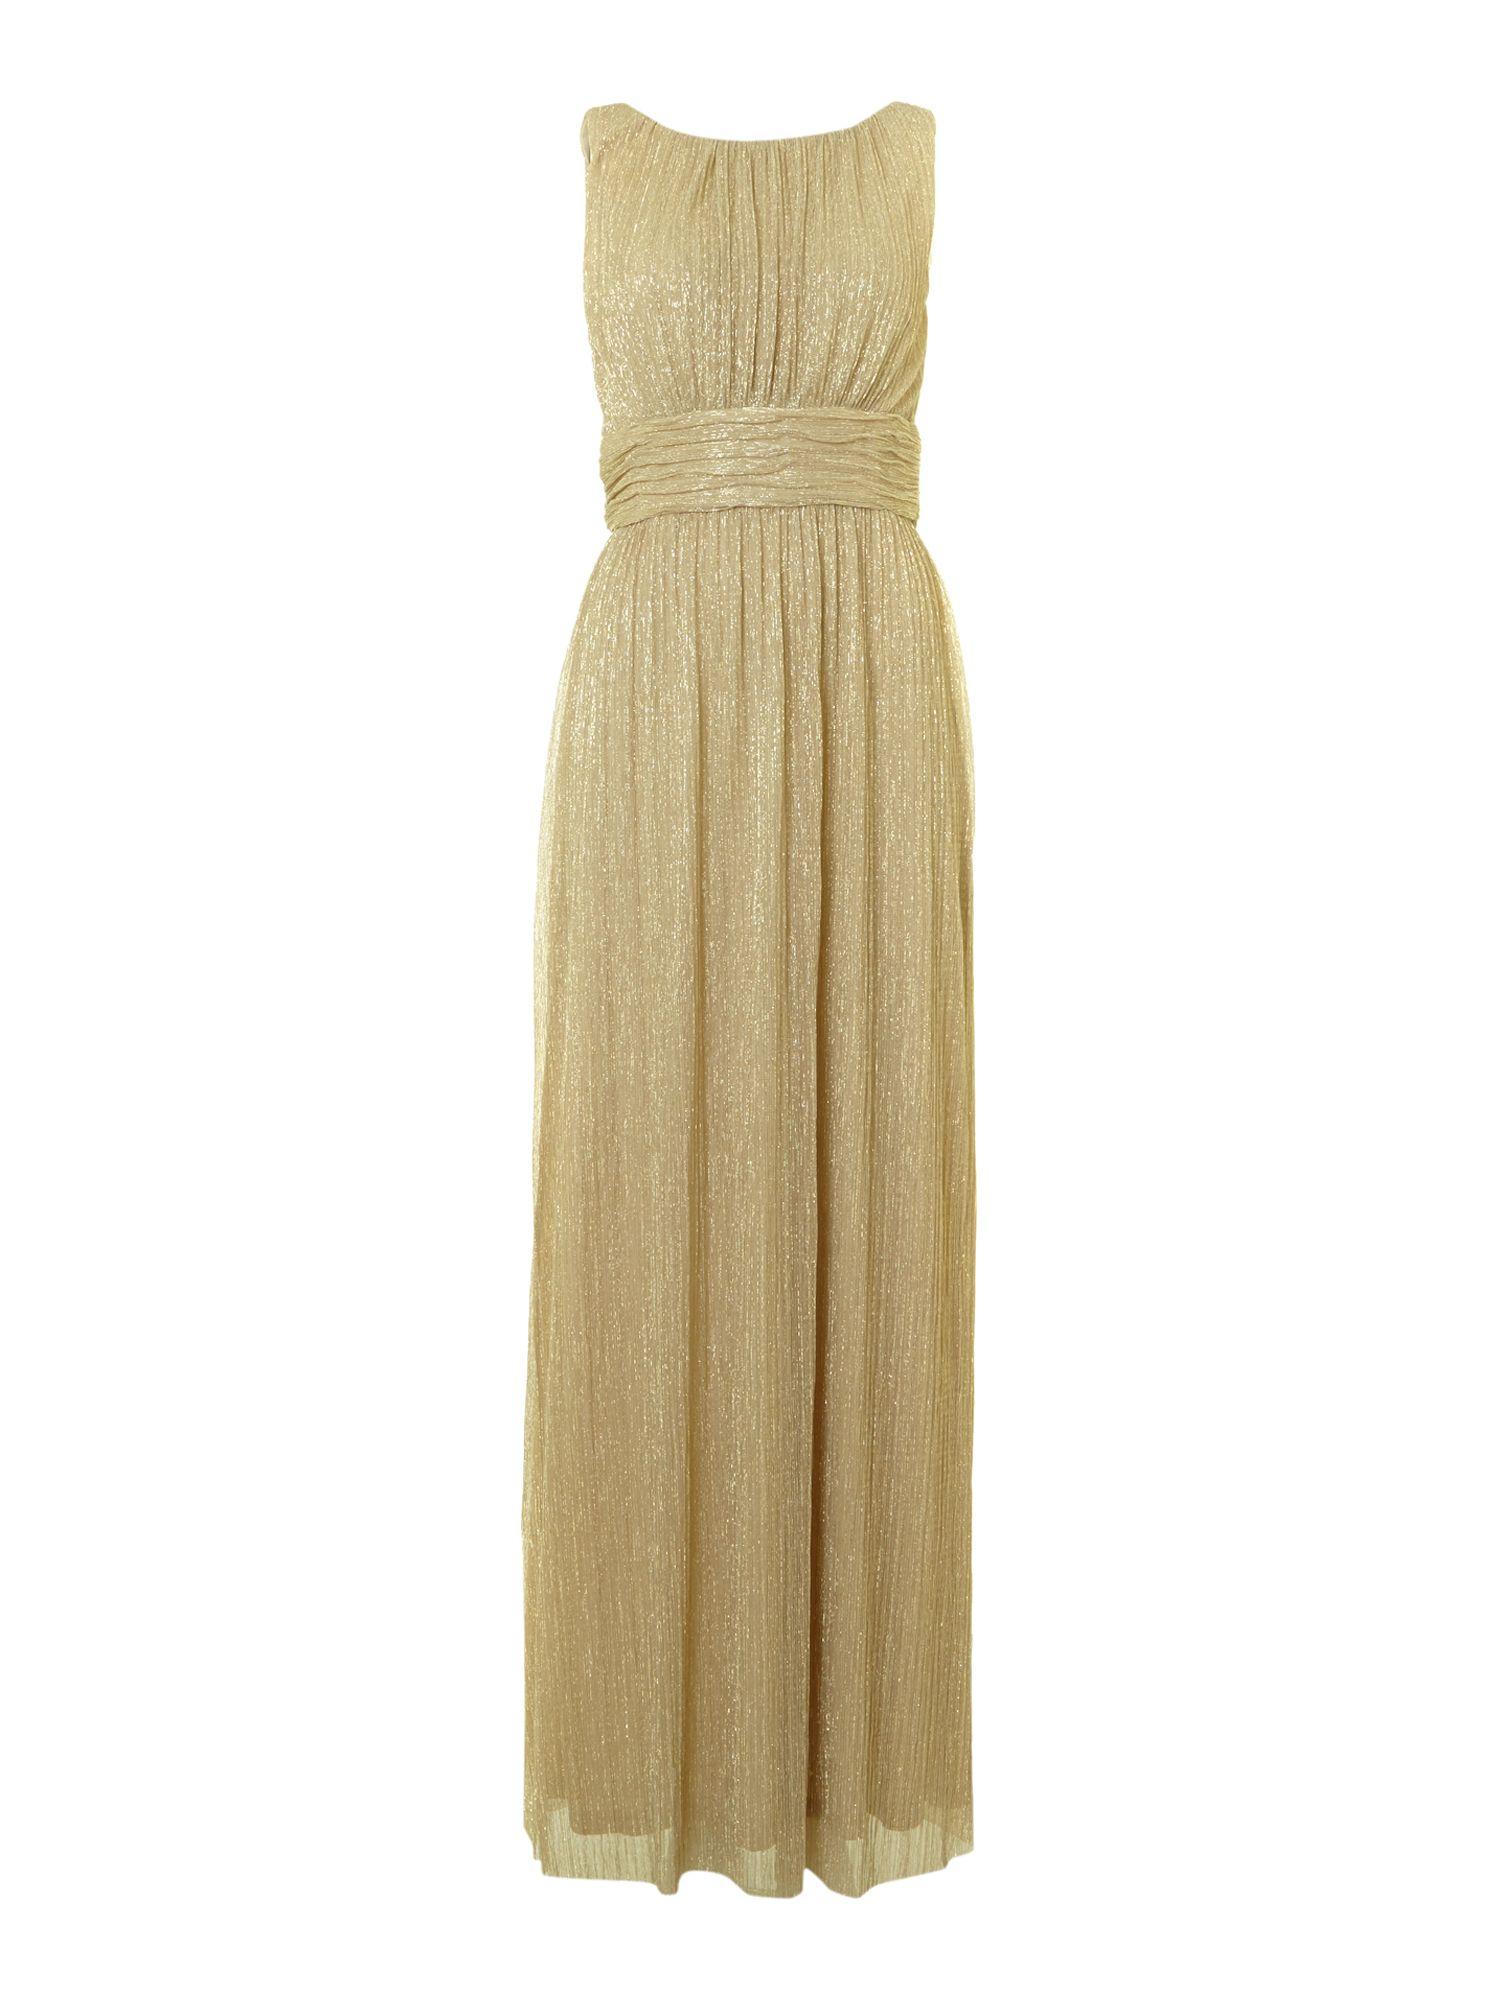 Women's Metallic Lurex Maxi Dress